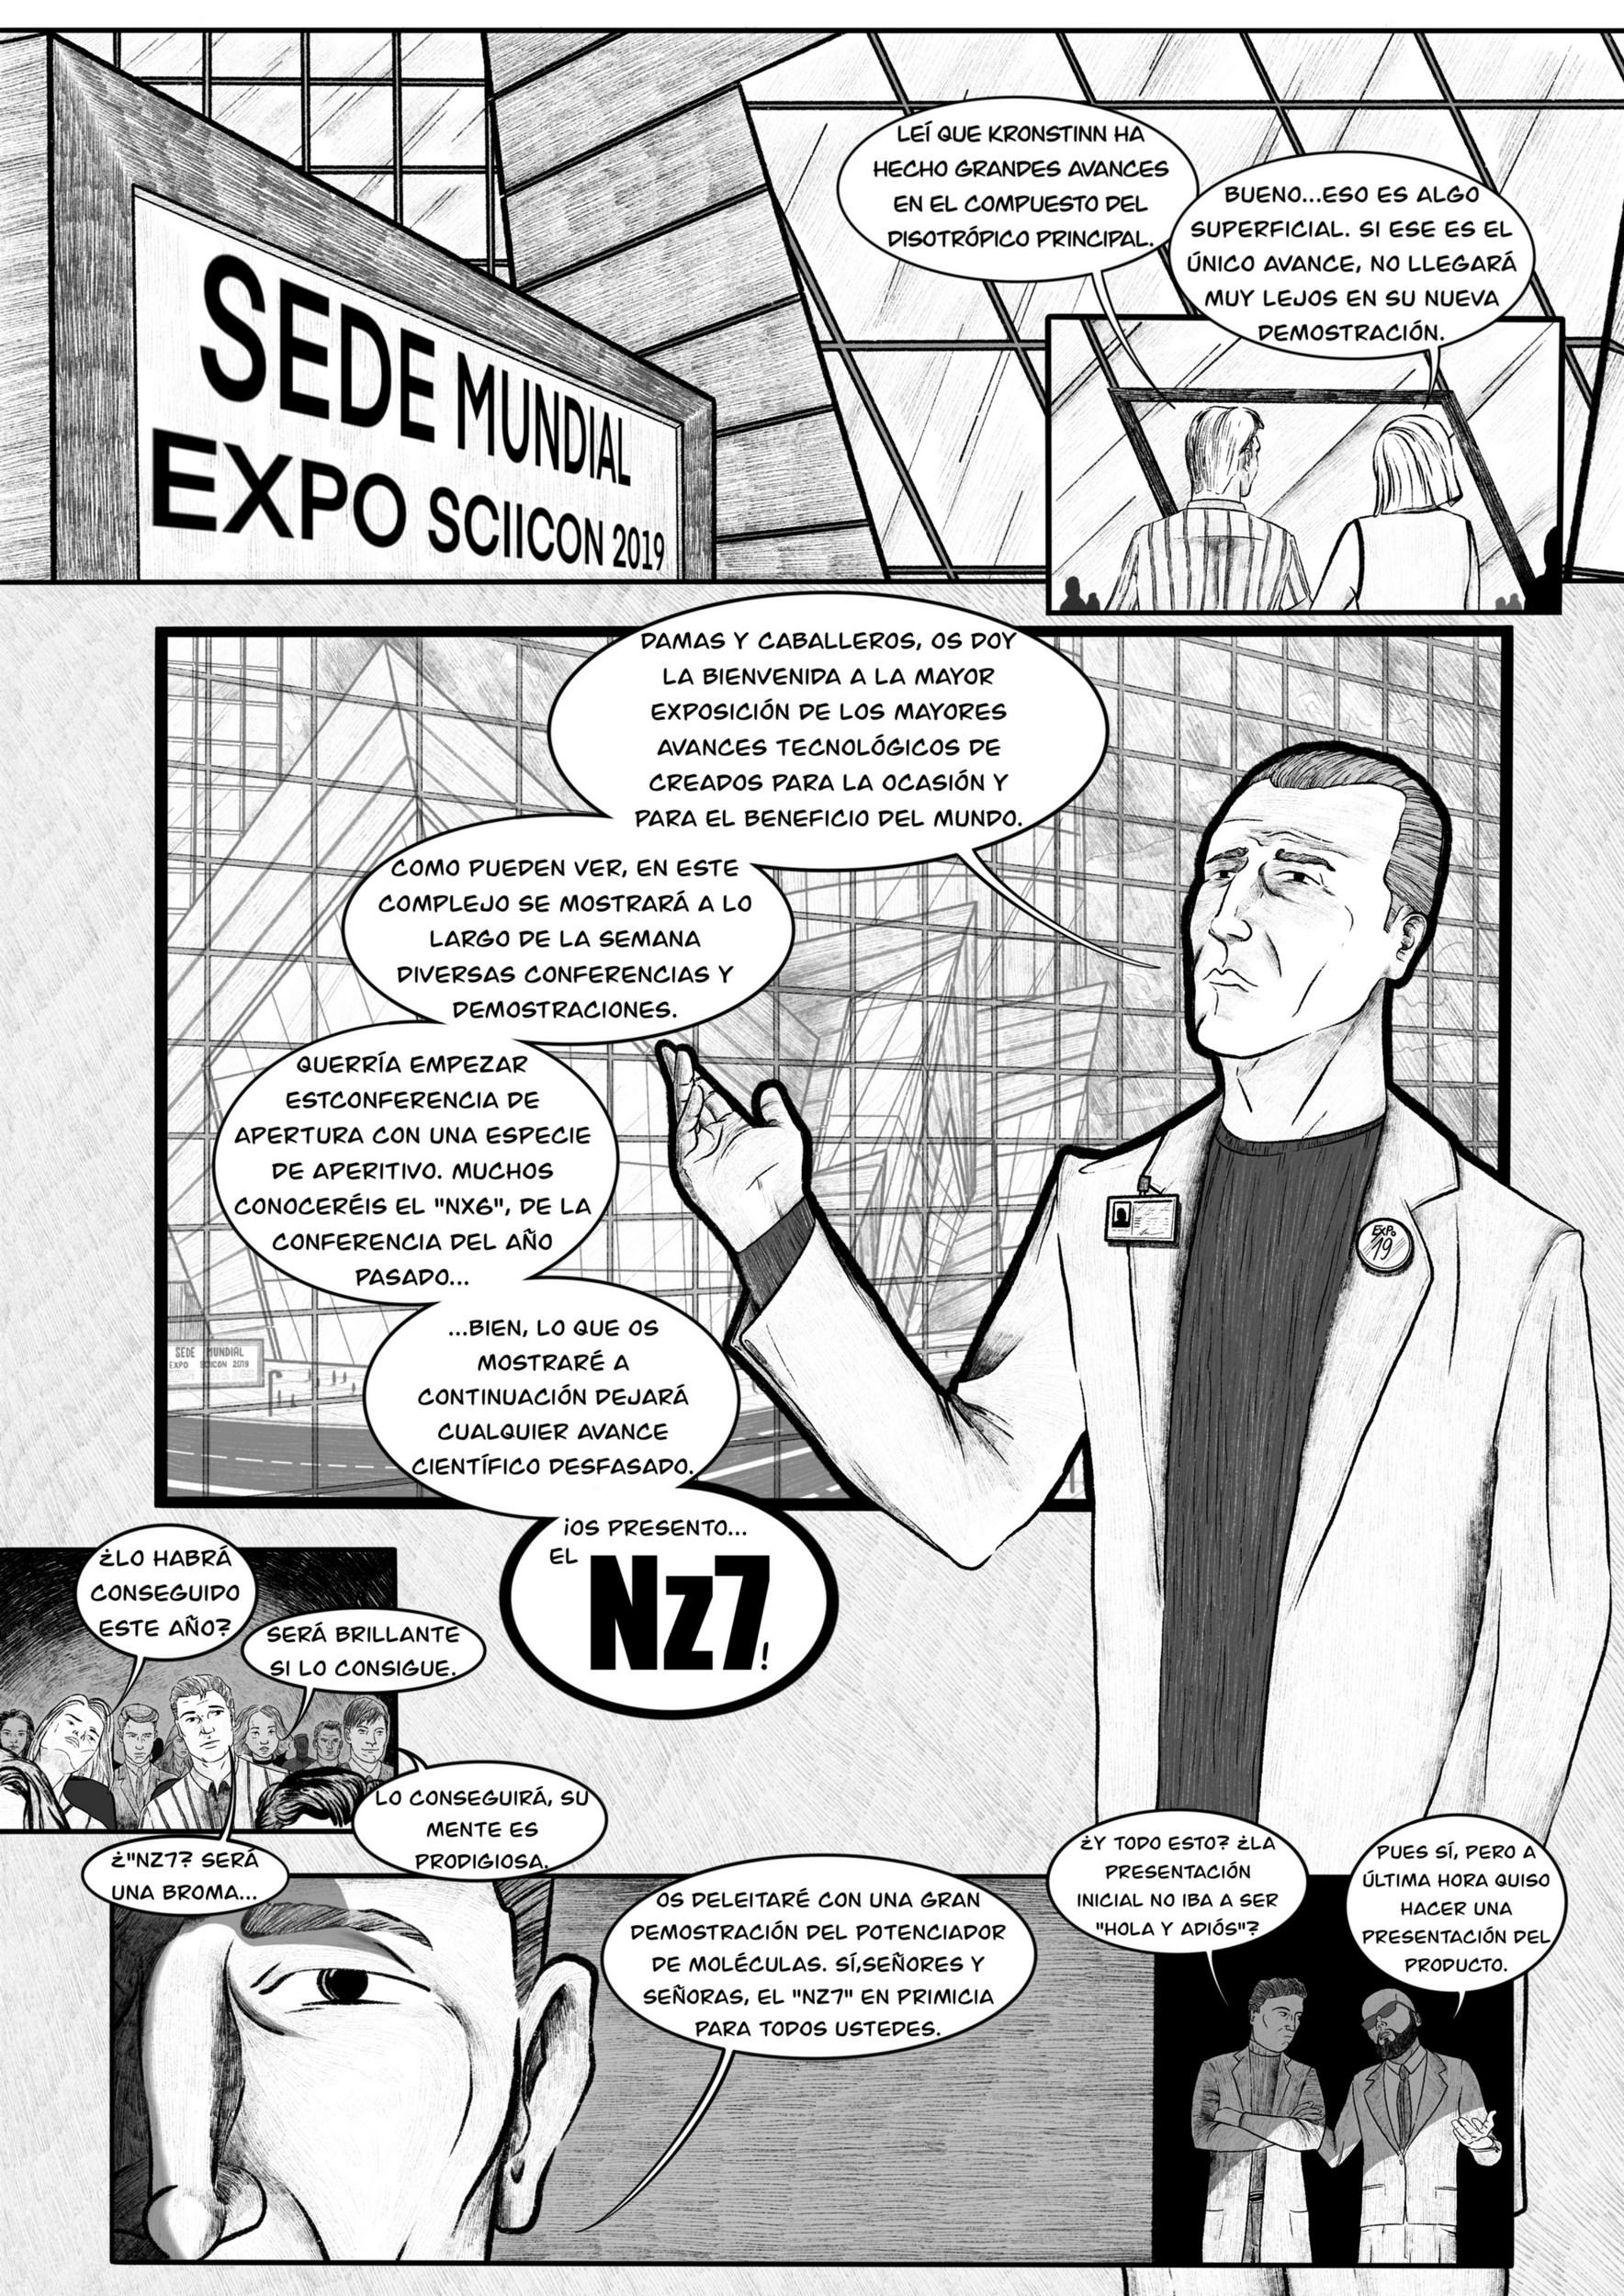 04_ Antonio Jiménez Castilla_IMG_2739_2500_0012